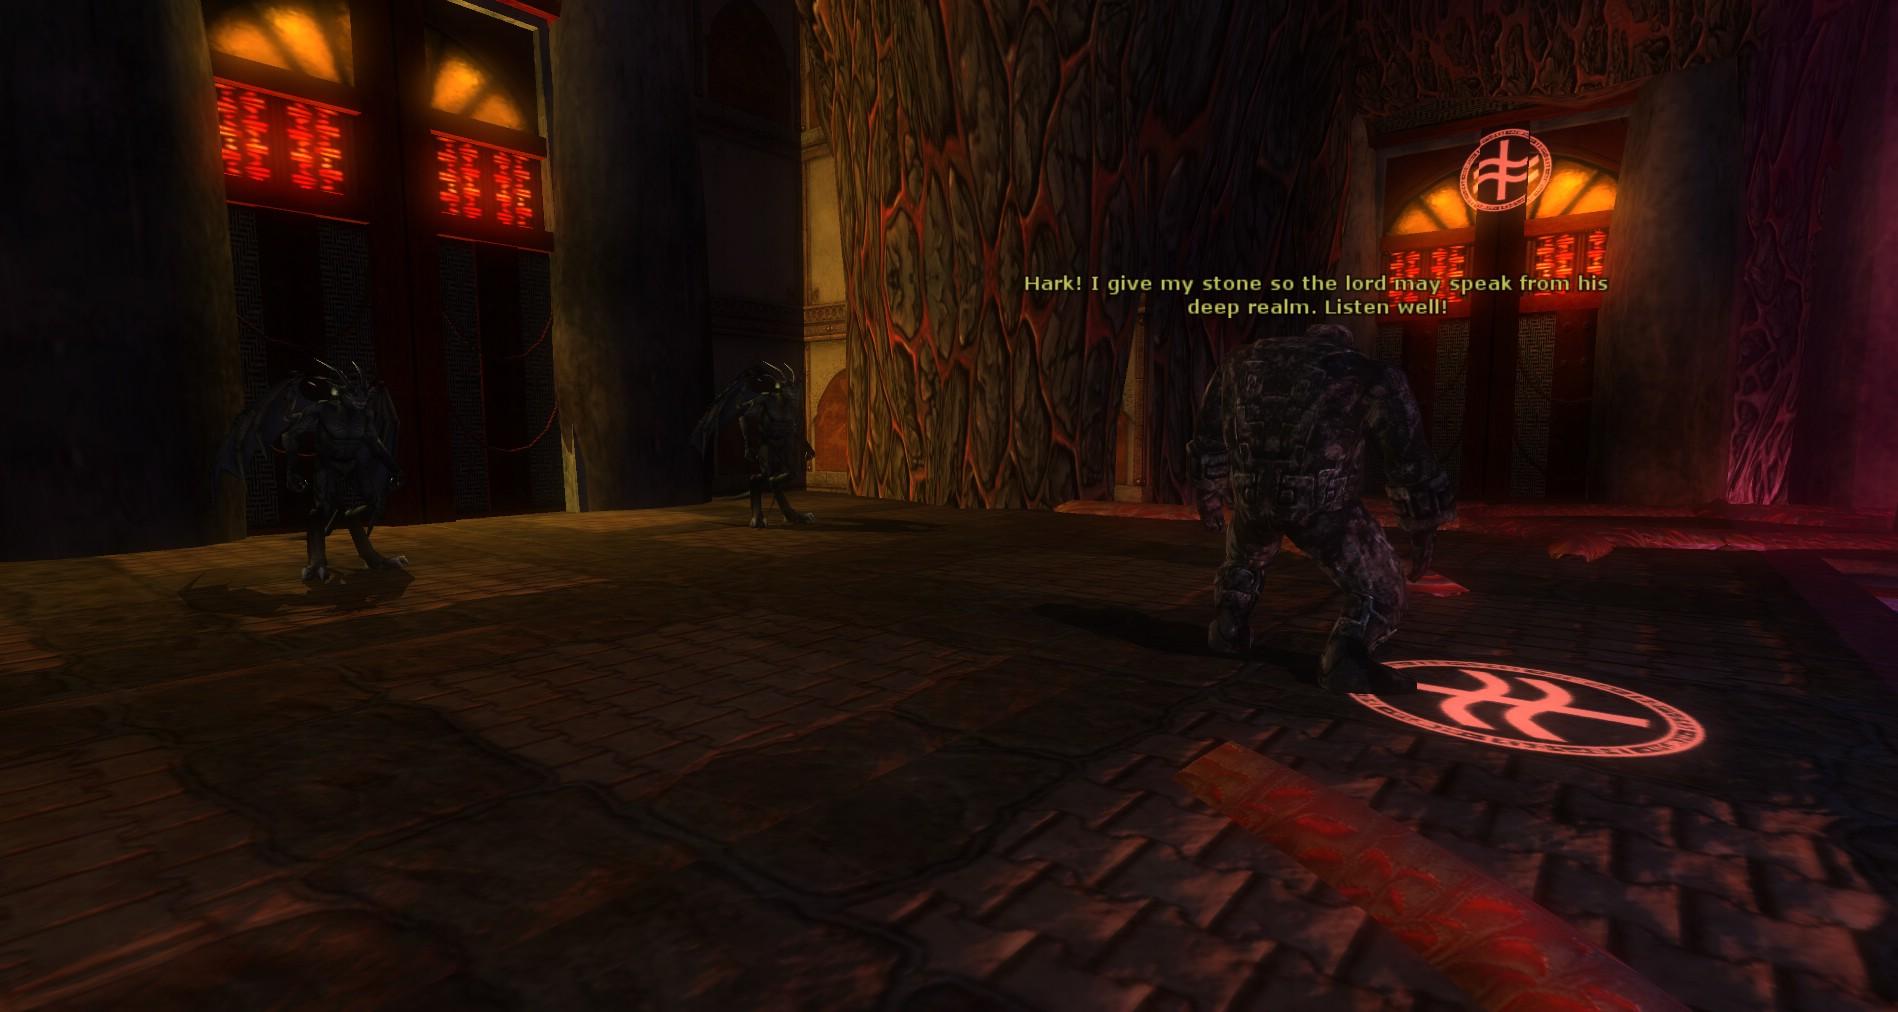 u10-lord-of-eyes-stone-minions-summoning-orlassk